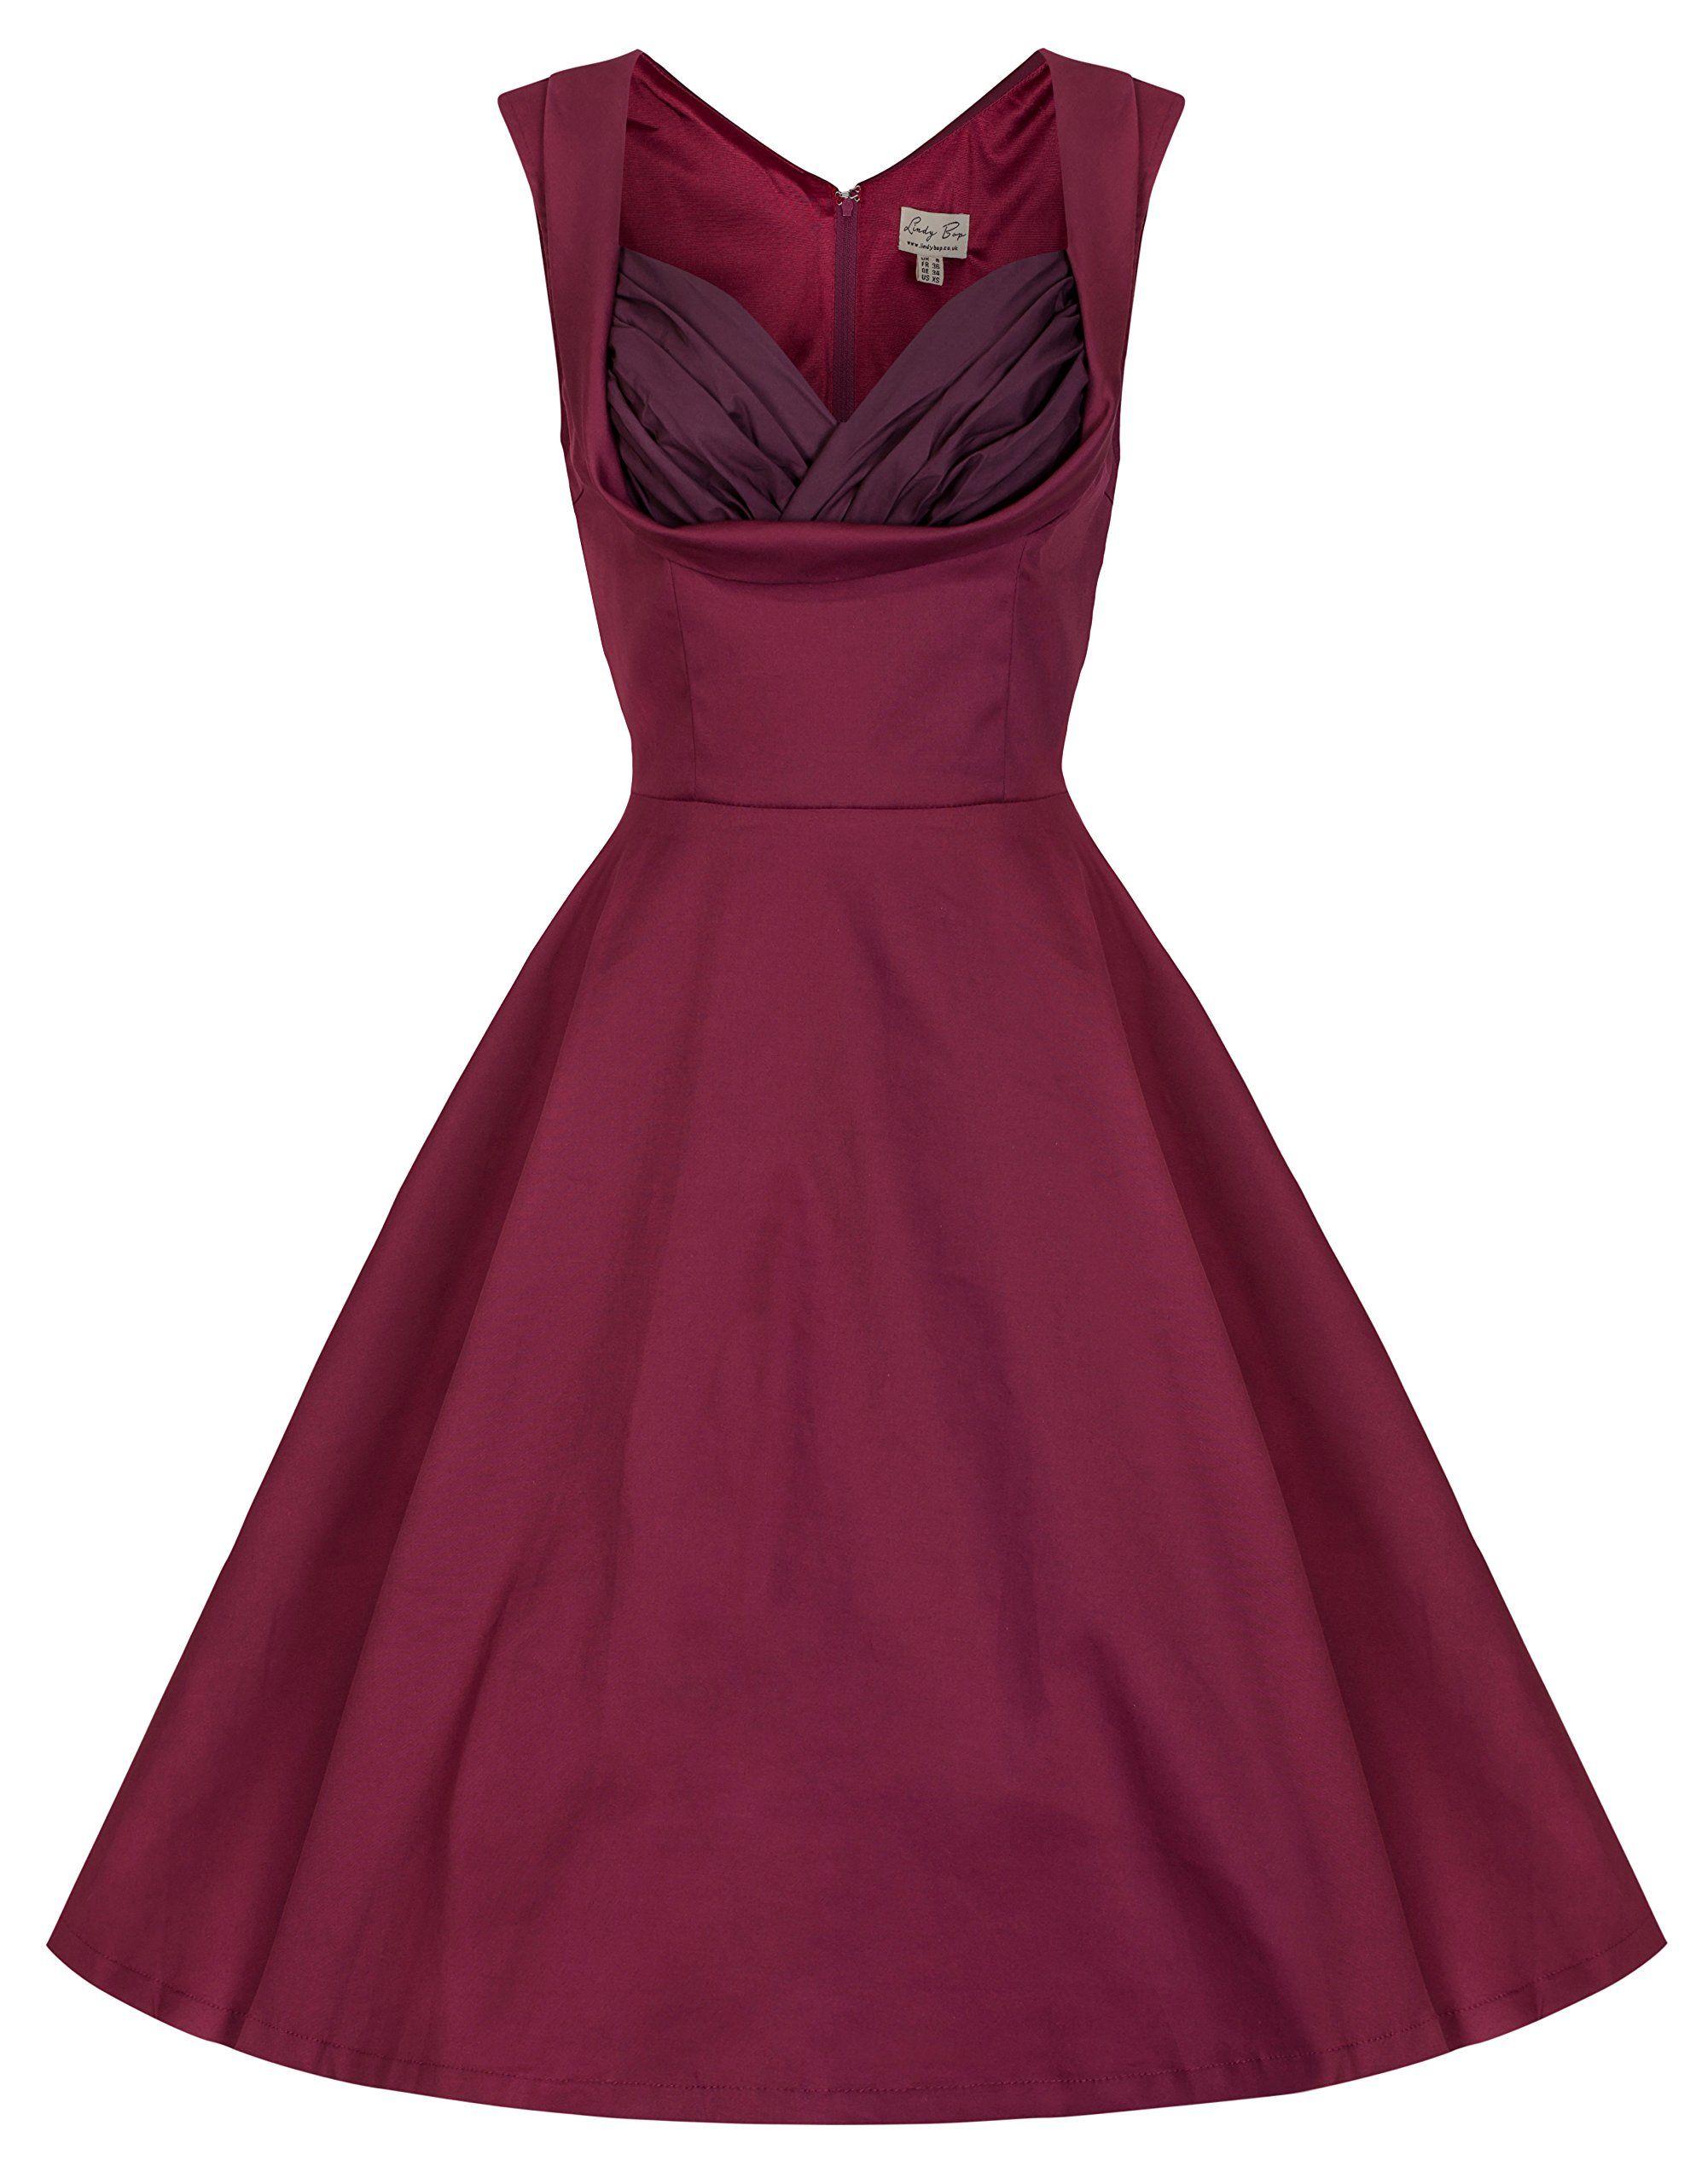 7bab2e5aceeb Lindy Bop  Ophelia  Vintage 1950 s Prom Swing Dress at Amazon Women s  Clothing store